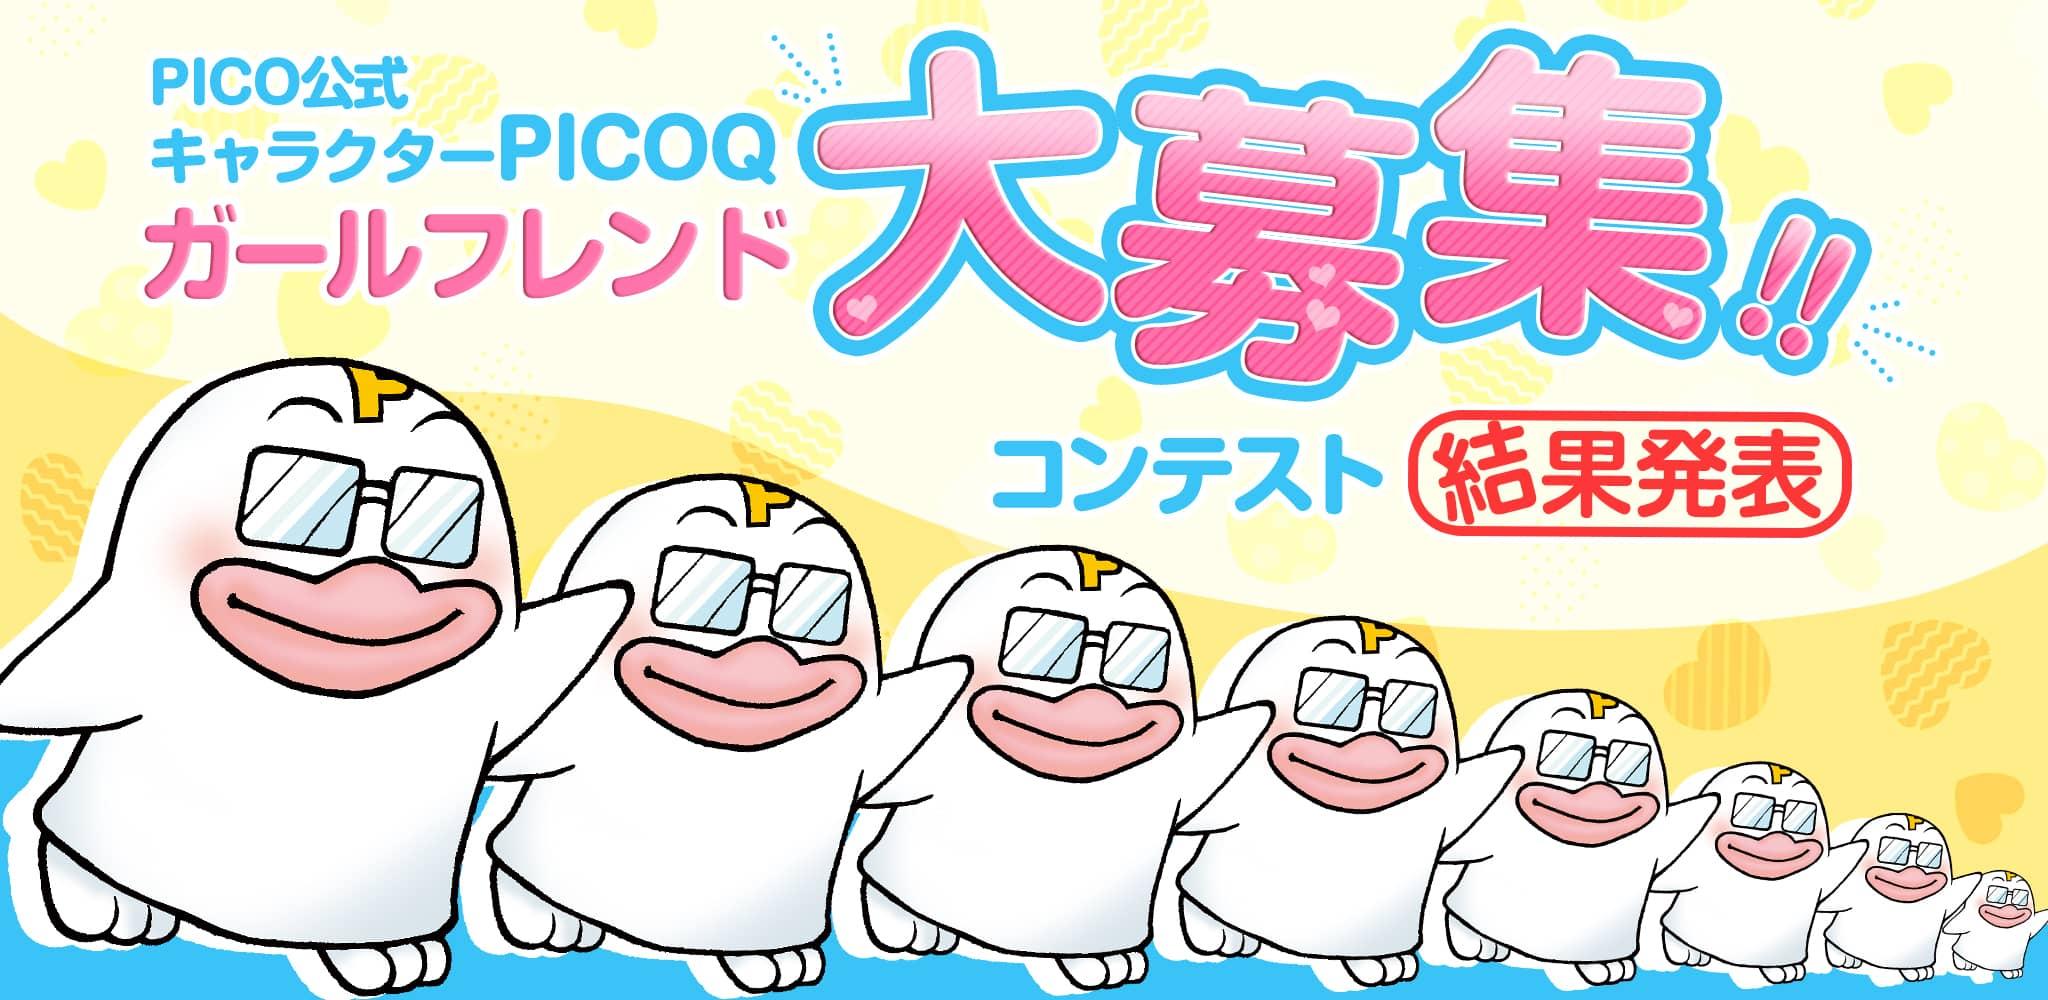 PICO公式キャラクターPICOQガールフレンド大募集!!コンテスト 結果発表   コンテスト - アートストリート(ART street) by MediBang